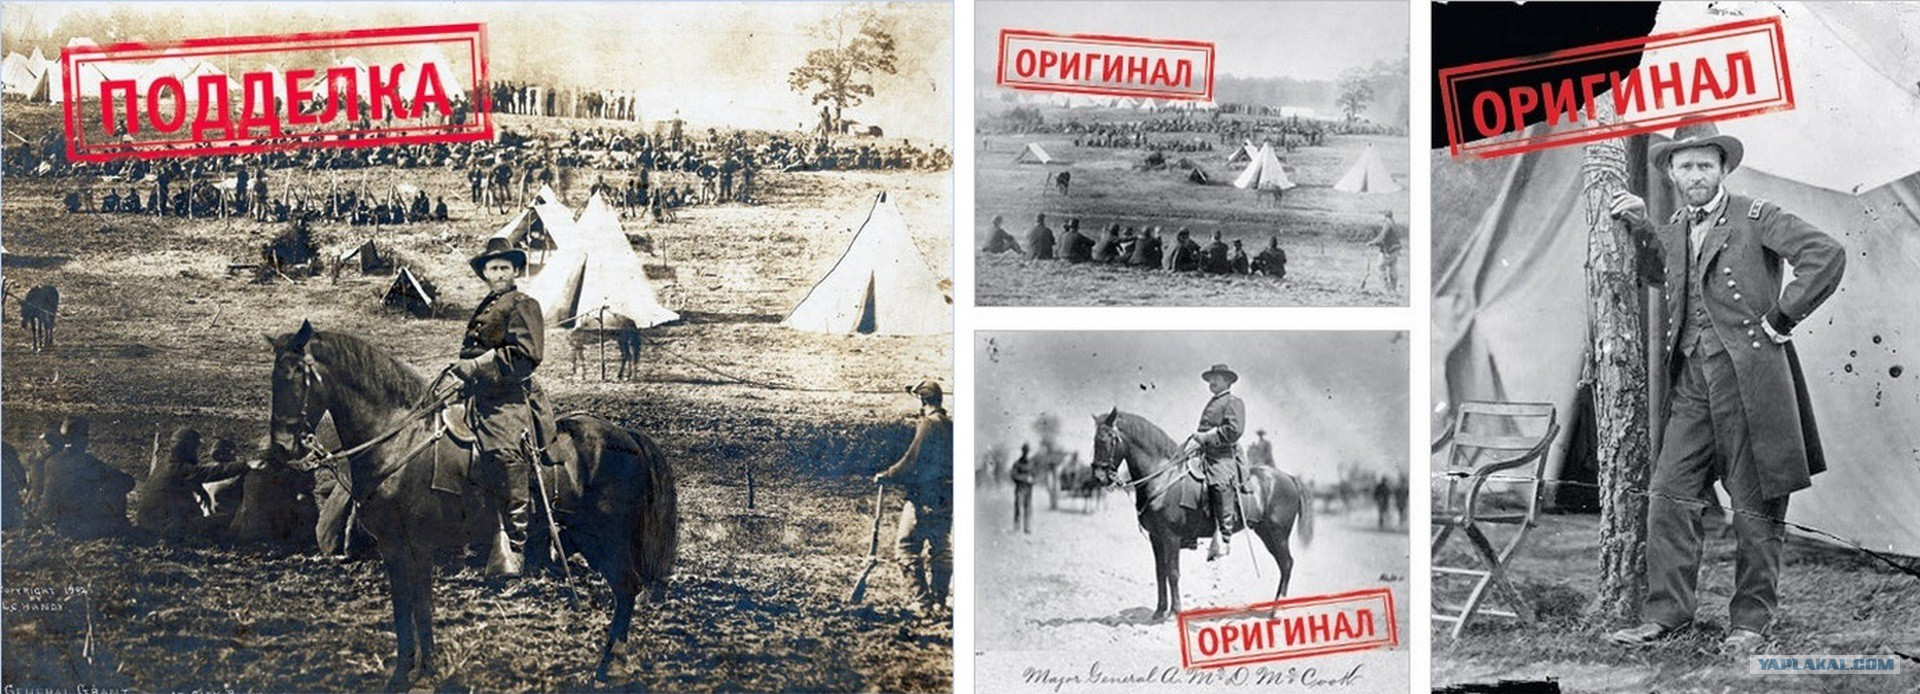 генерал майор басов: